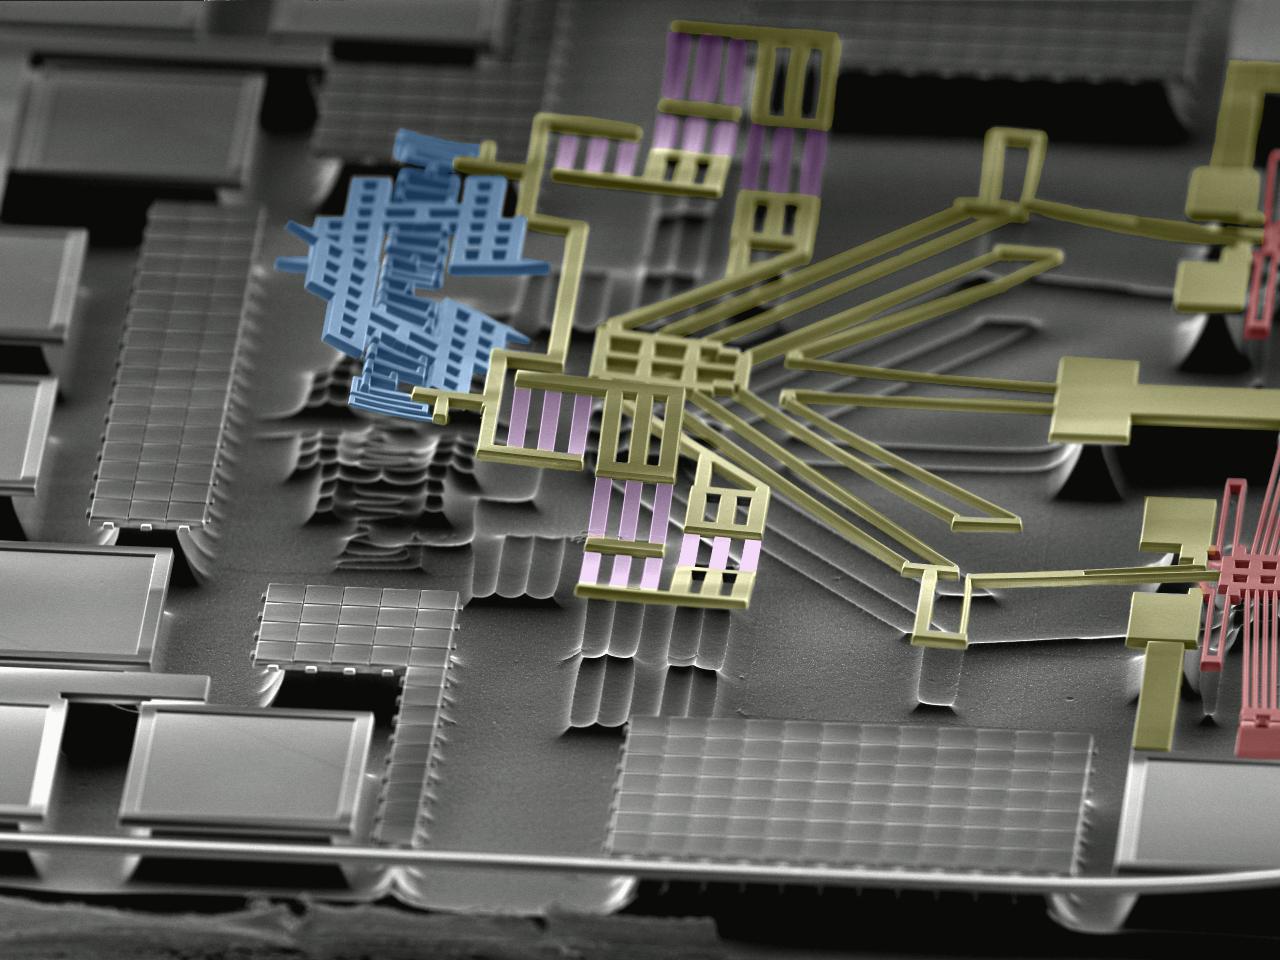 Colourized SEM Image of a single-chip AFM